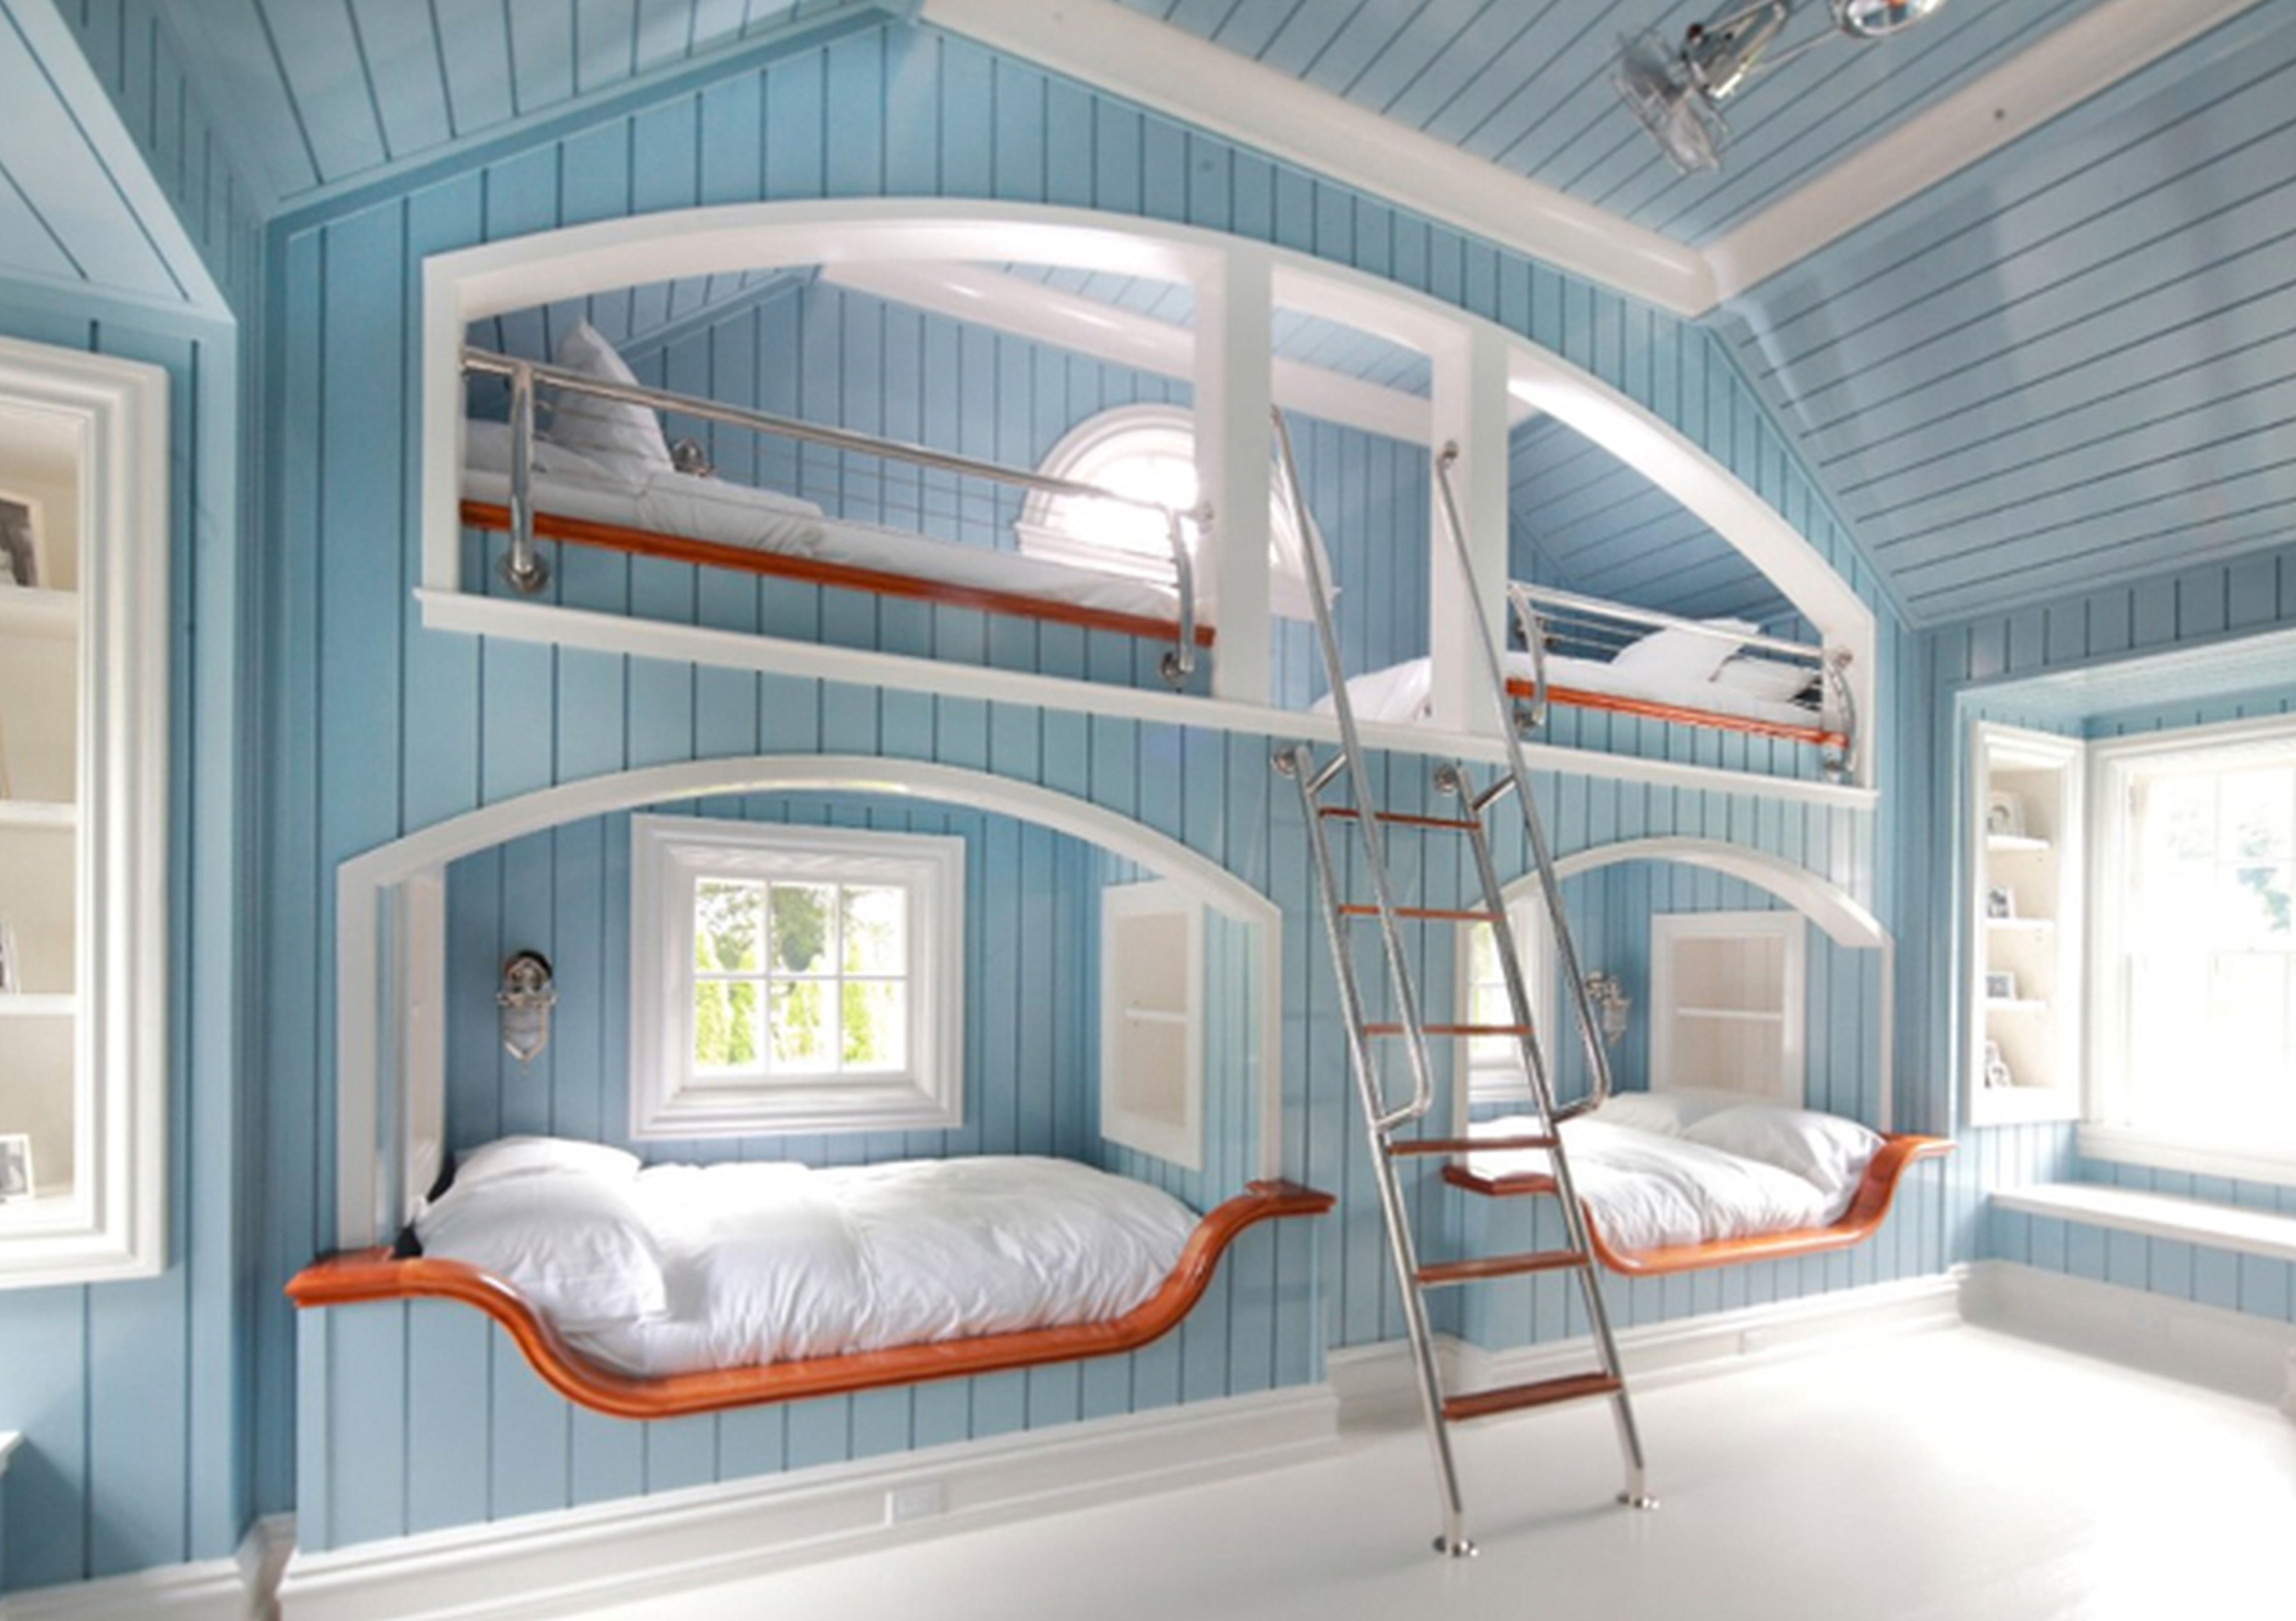 You Me Etagenbett Holz : Kleine teenager schlafzimmer ideen